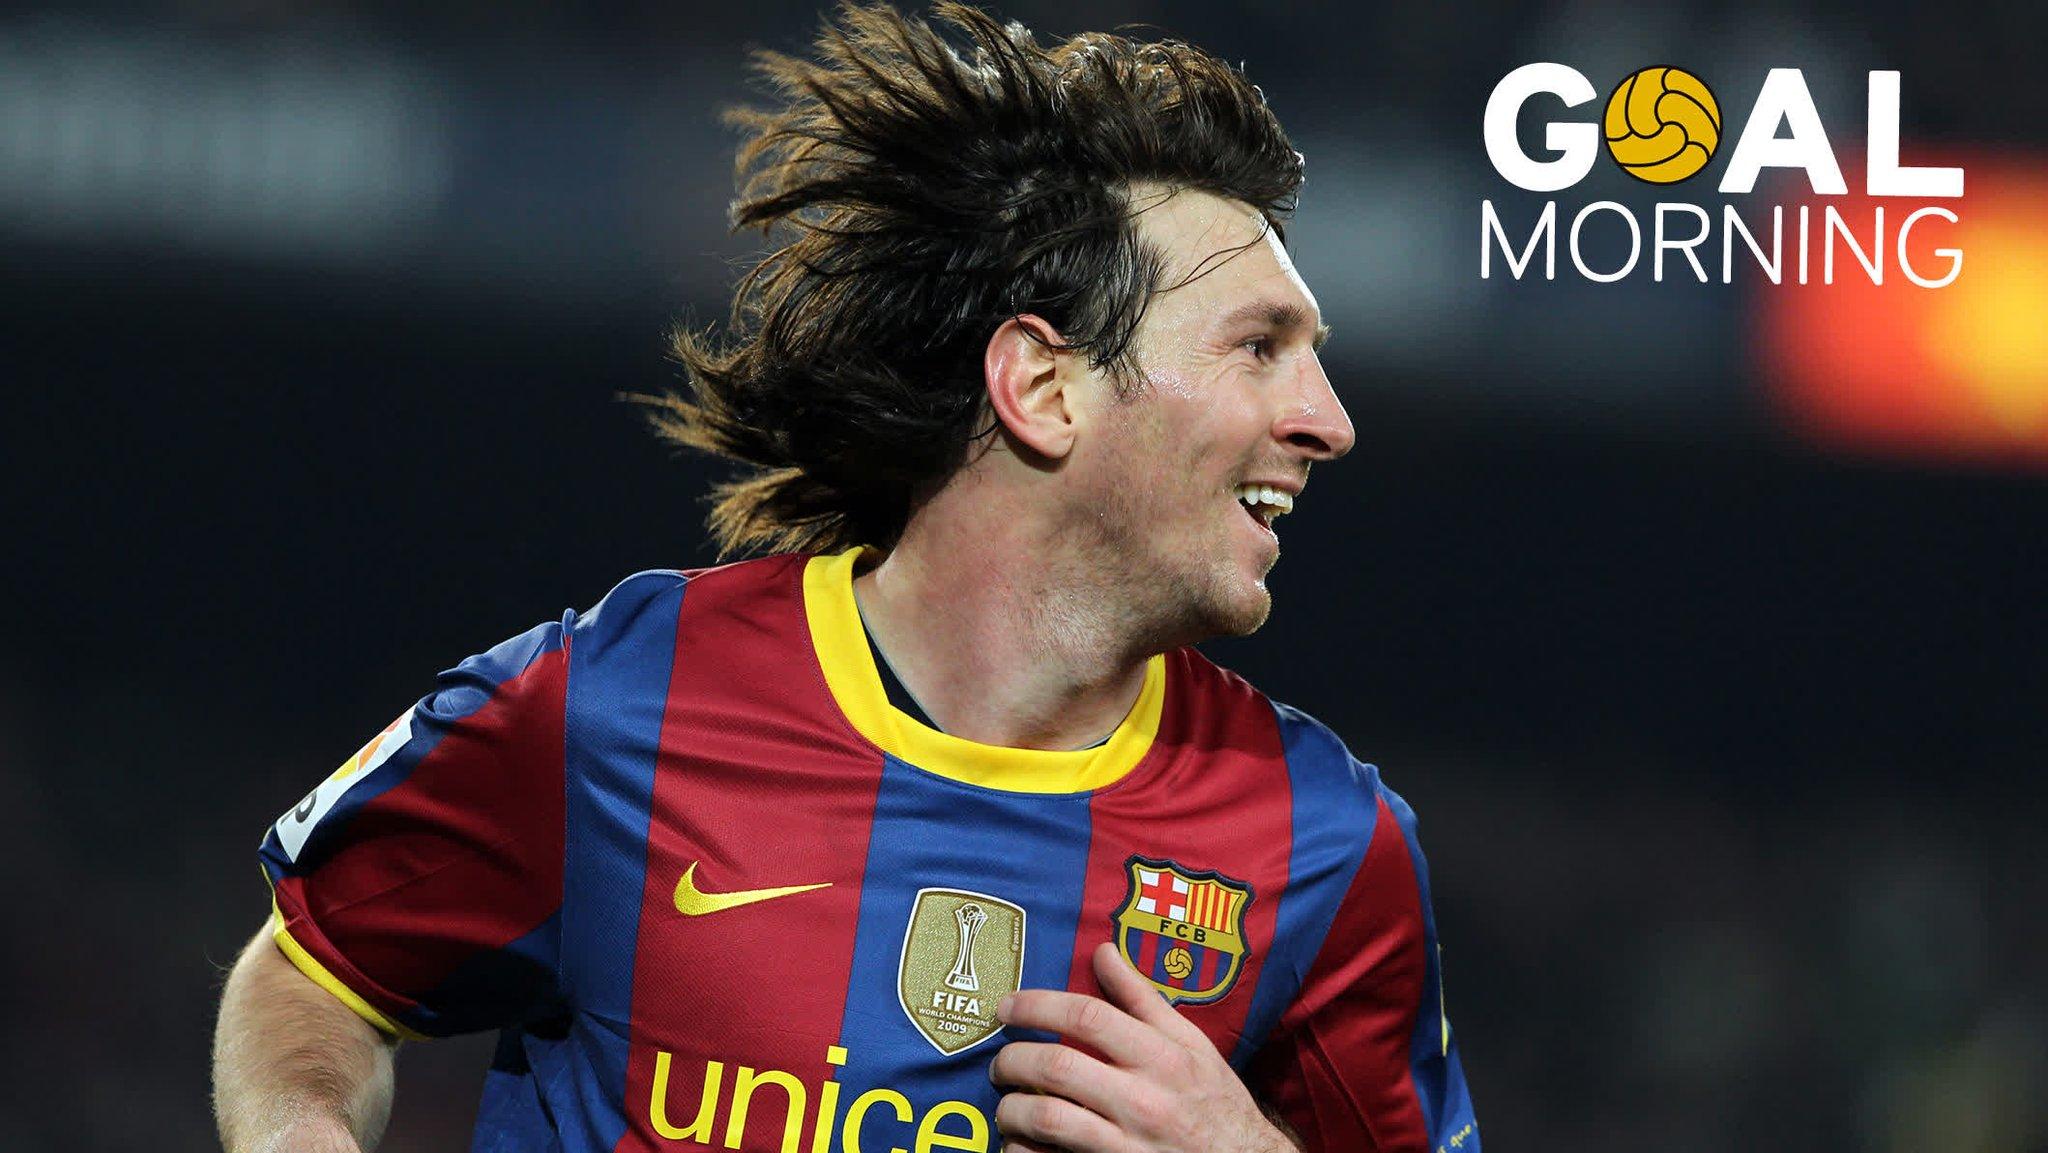 G⚽️AL MORNING!!!  We ❤️ Messi https://t.co/WldBWBOdoP